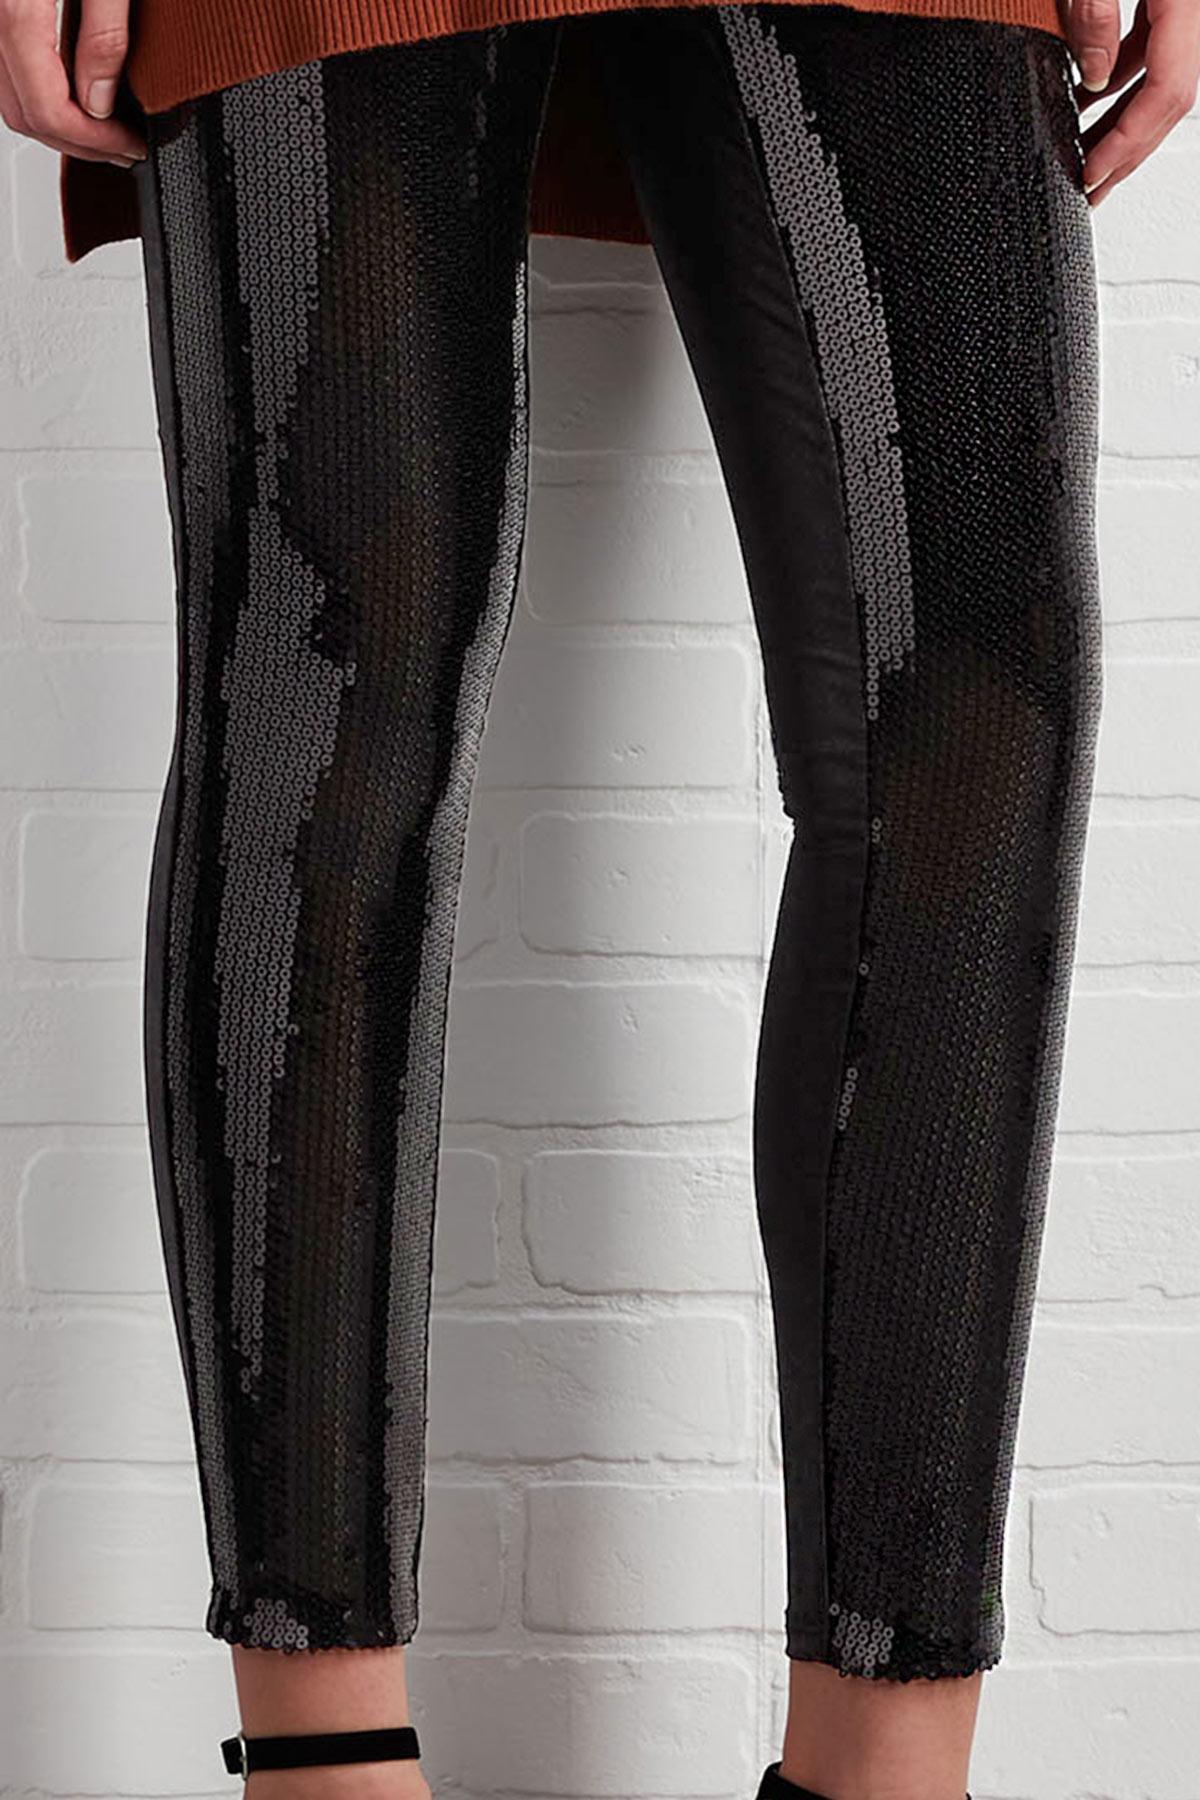 Sequin Shine Leggings